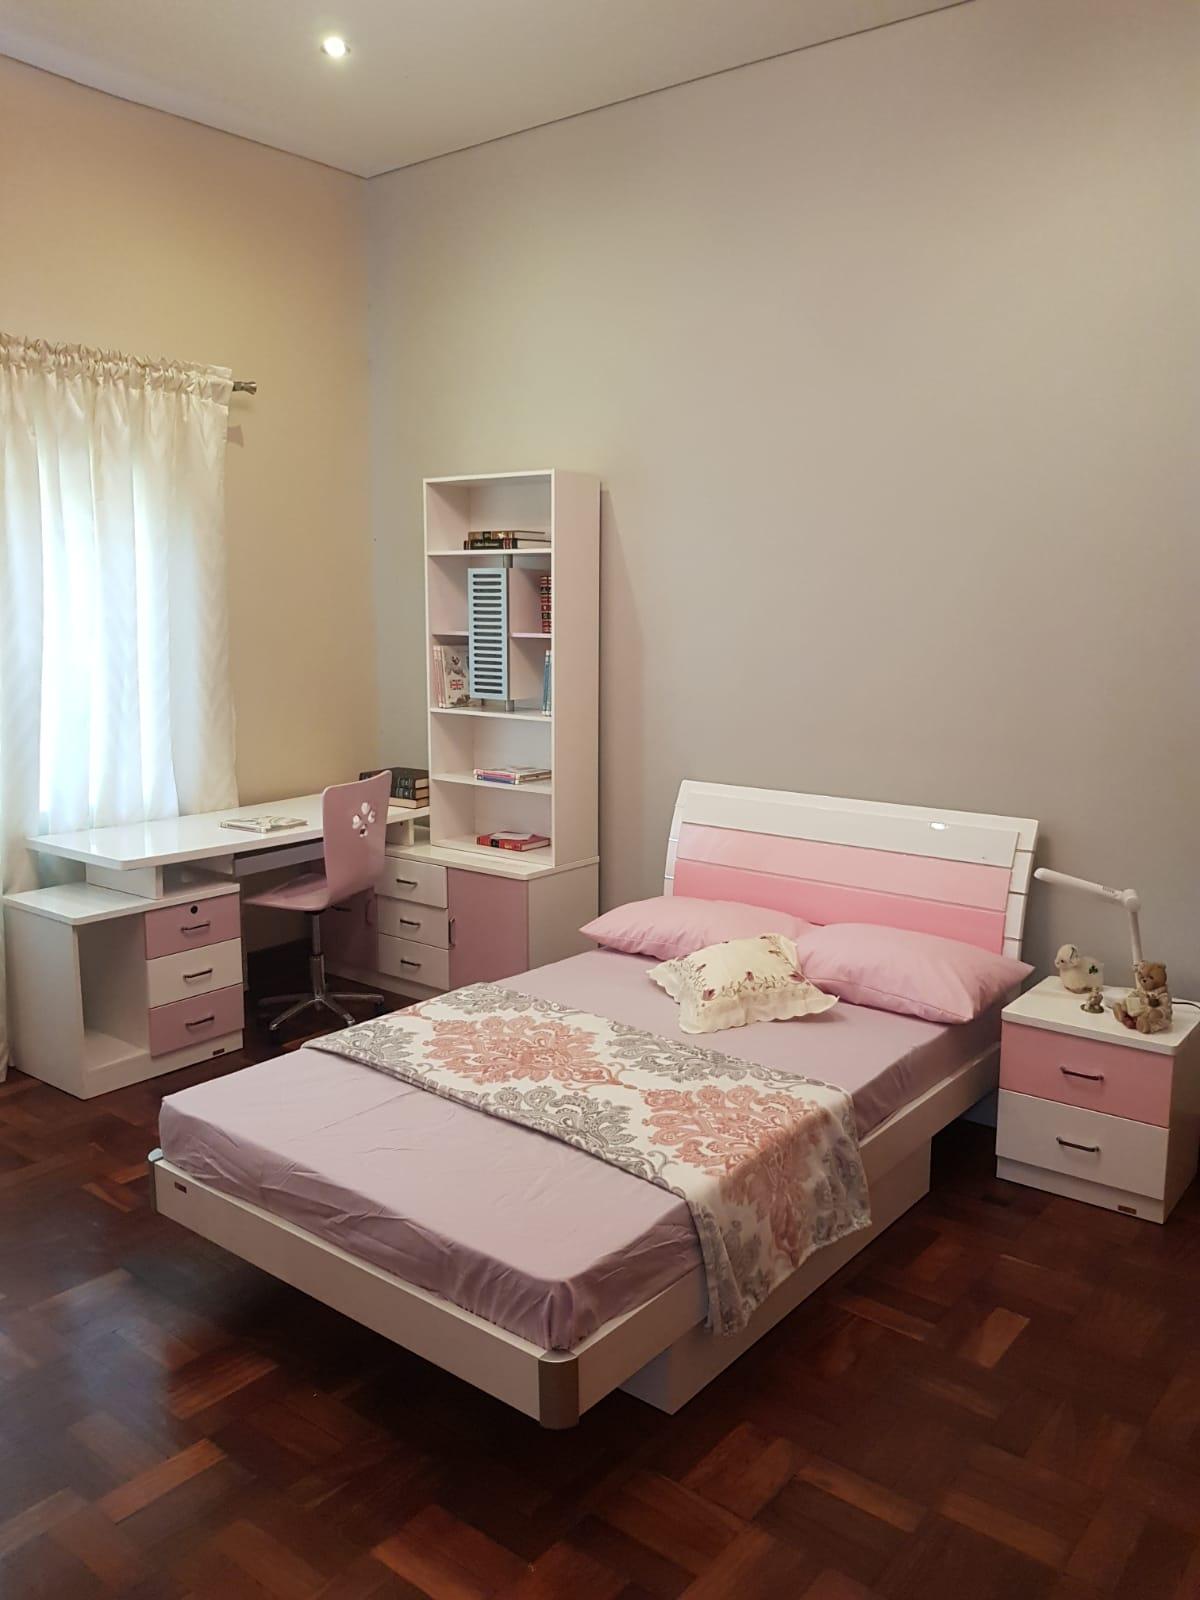 Poshtots Princess Bed Beds For Sale Poshtots Childrens Furniture